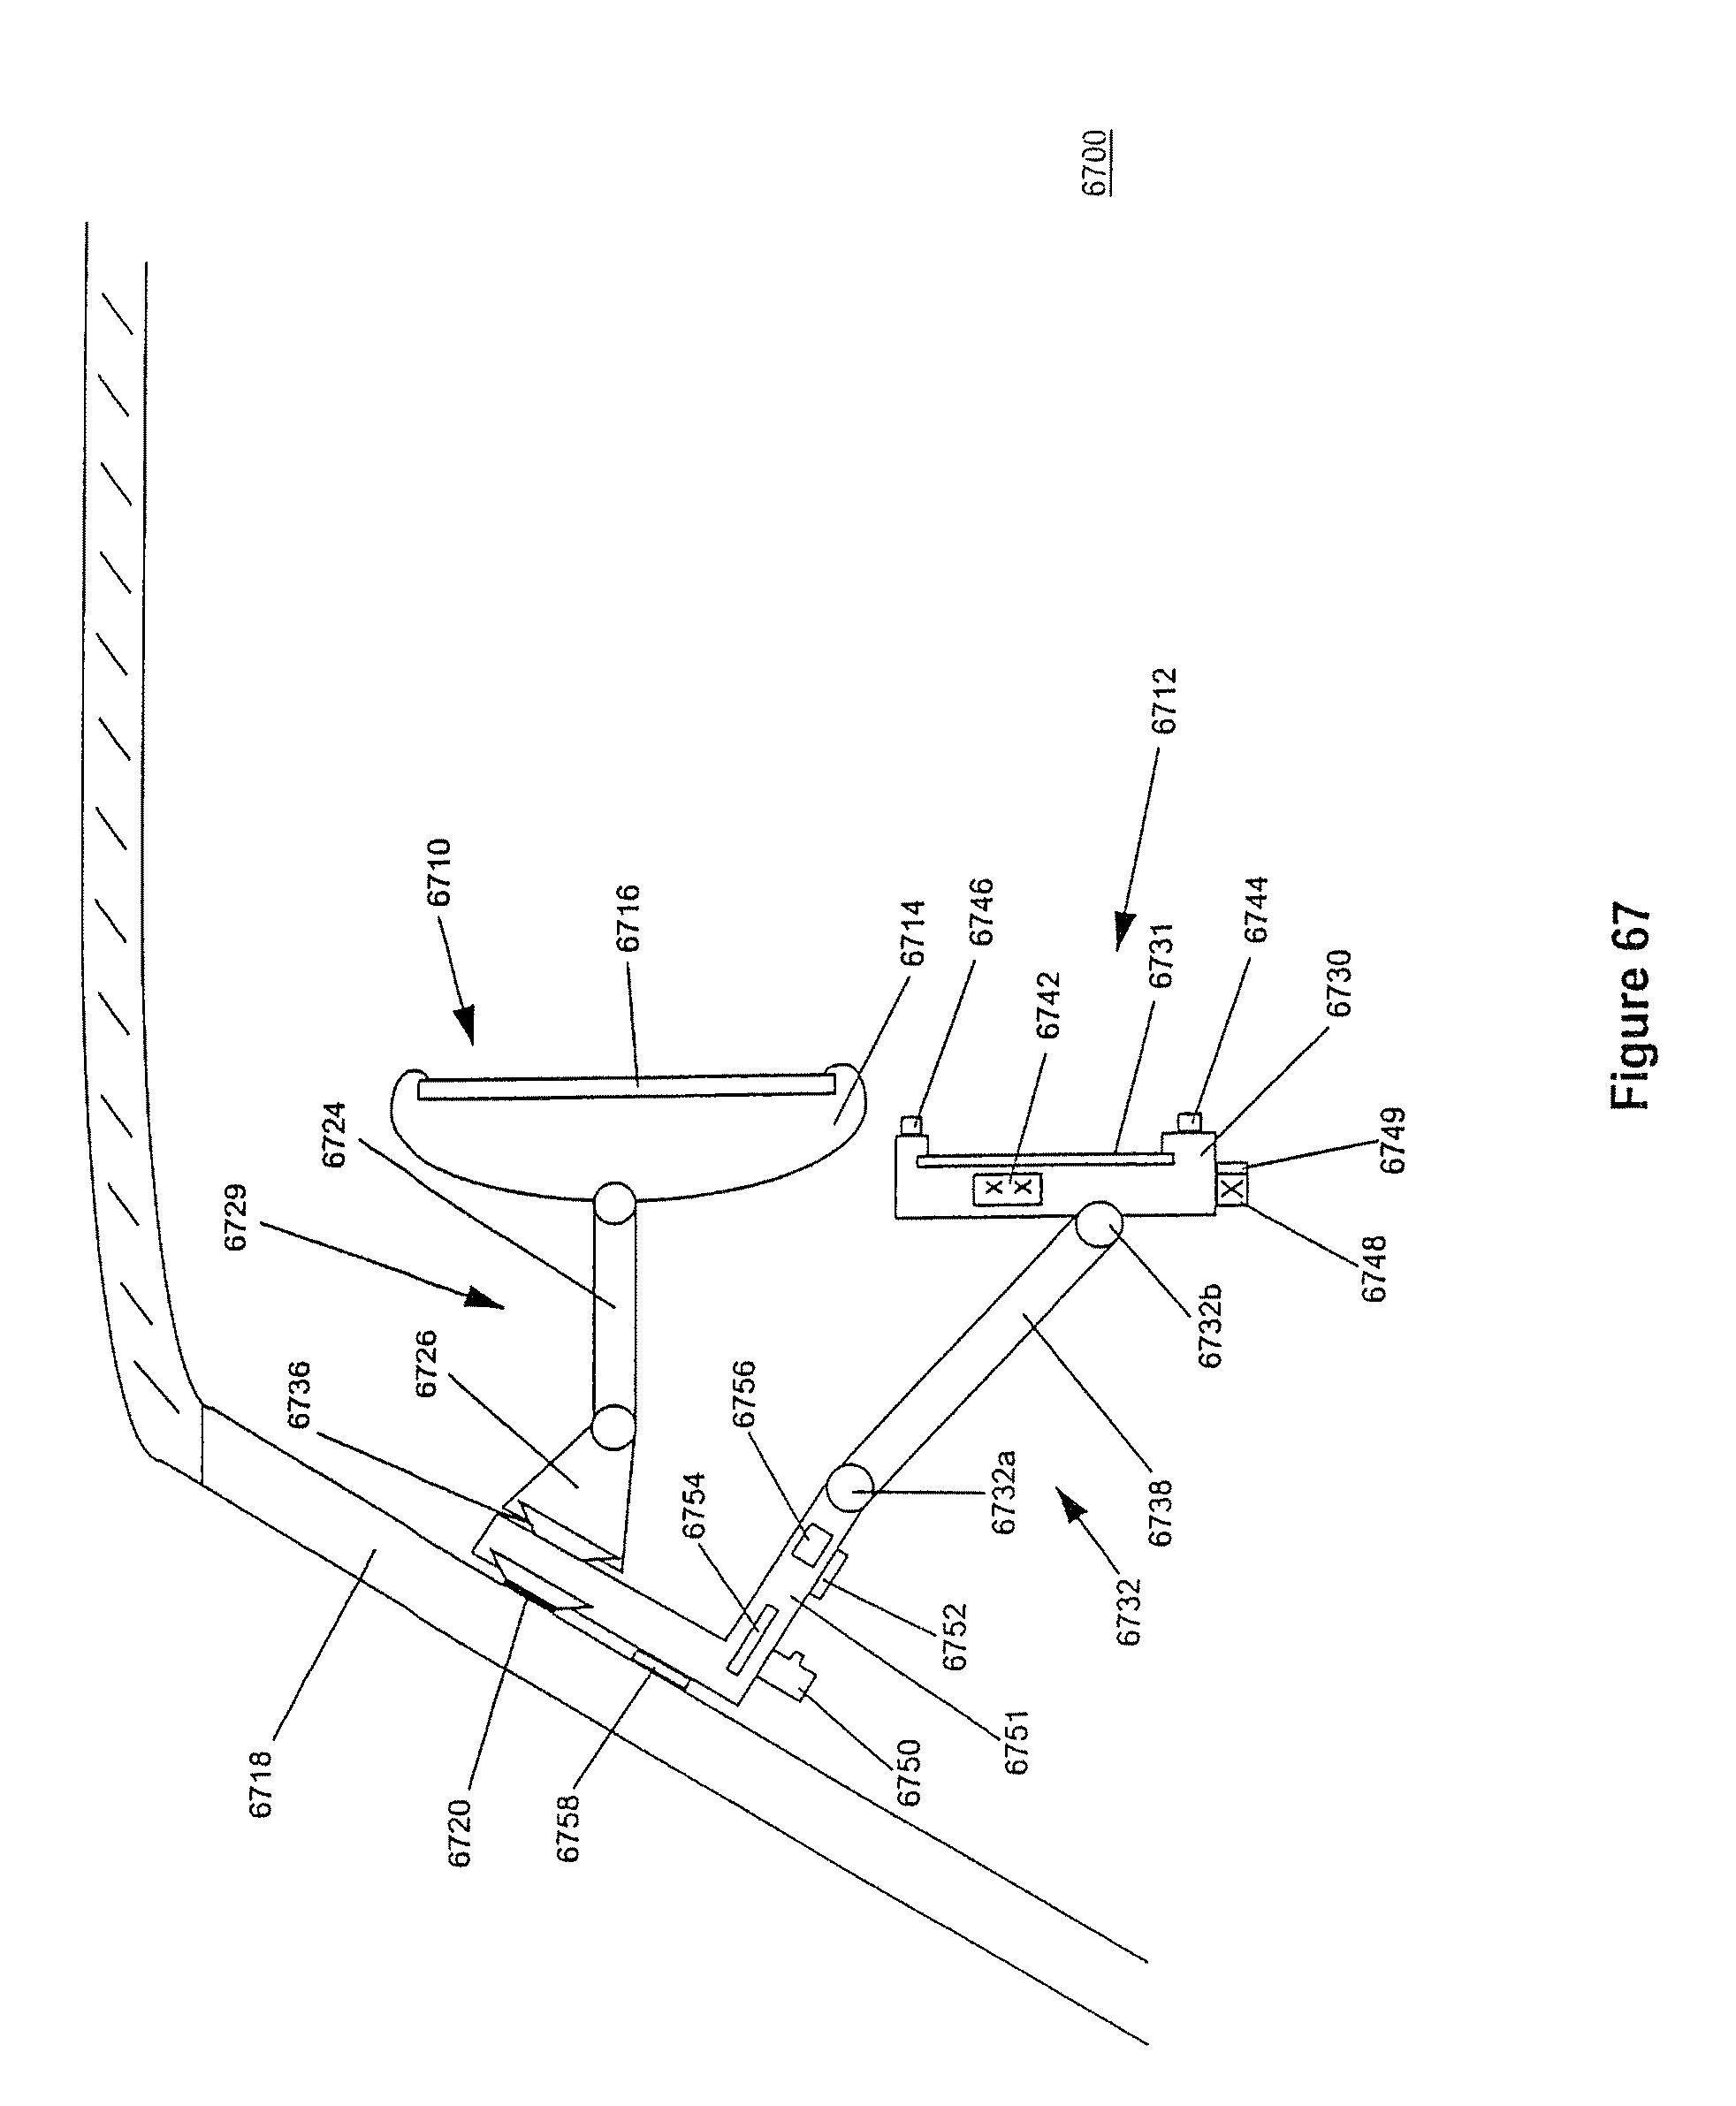 Diagram Am Transmitter Circuit Diagram Semi Rigid Coax Chinese Baja